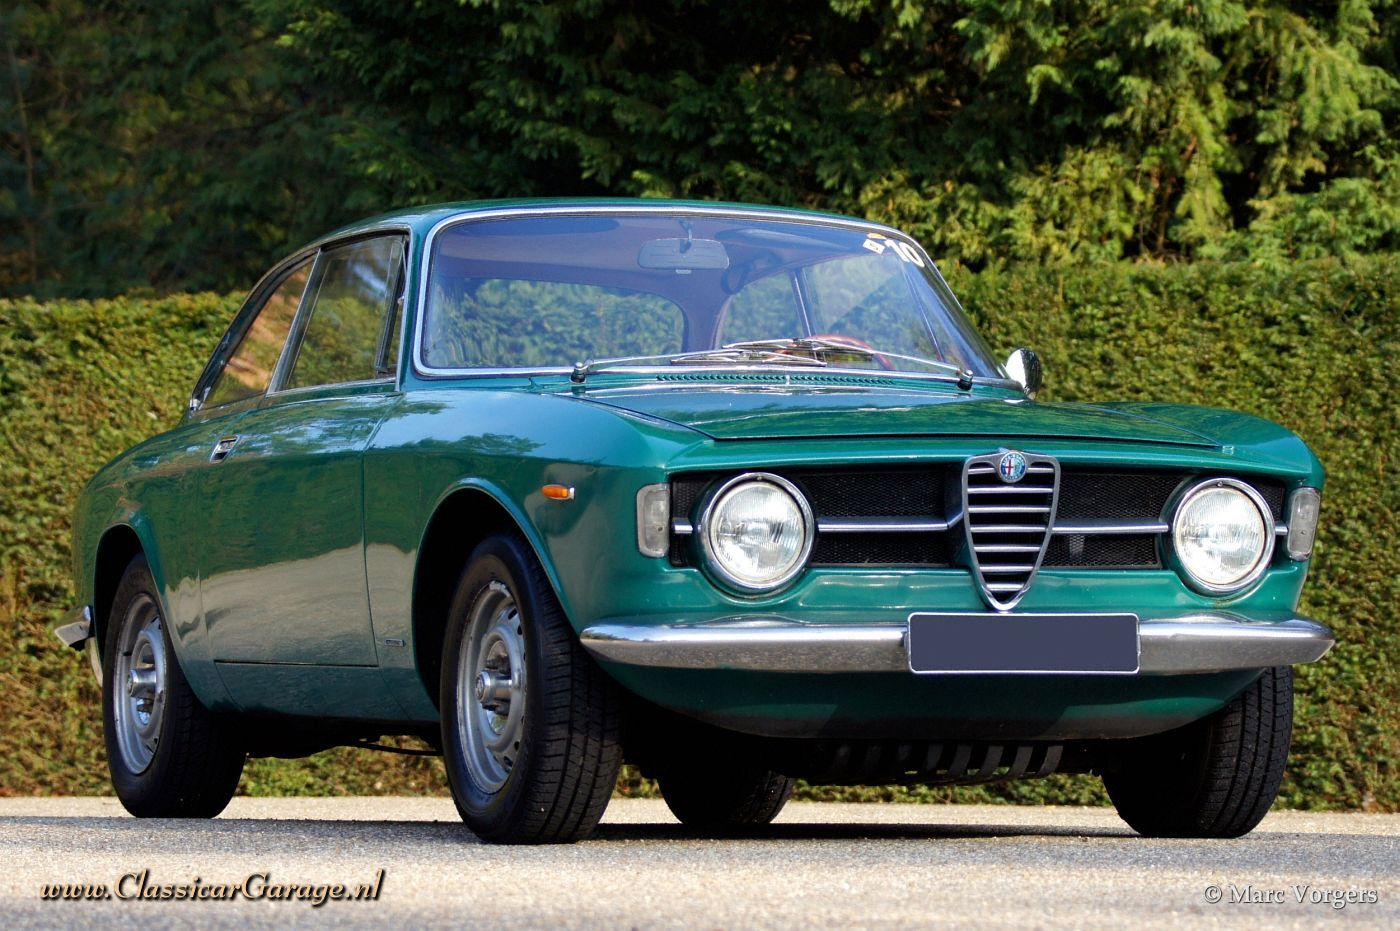 Alpha Romeo Giulia >> Alfa Romeo Giulia GT 1300 Junior, 1968 details